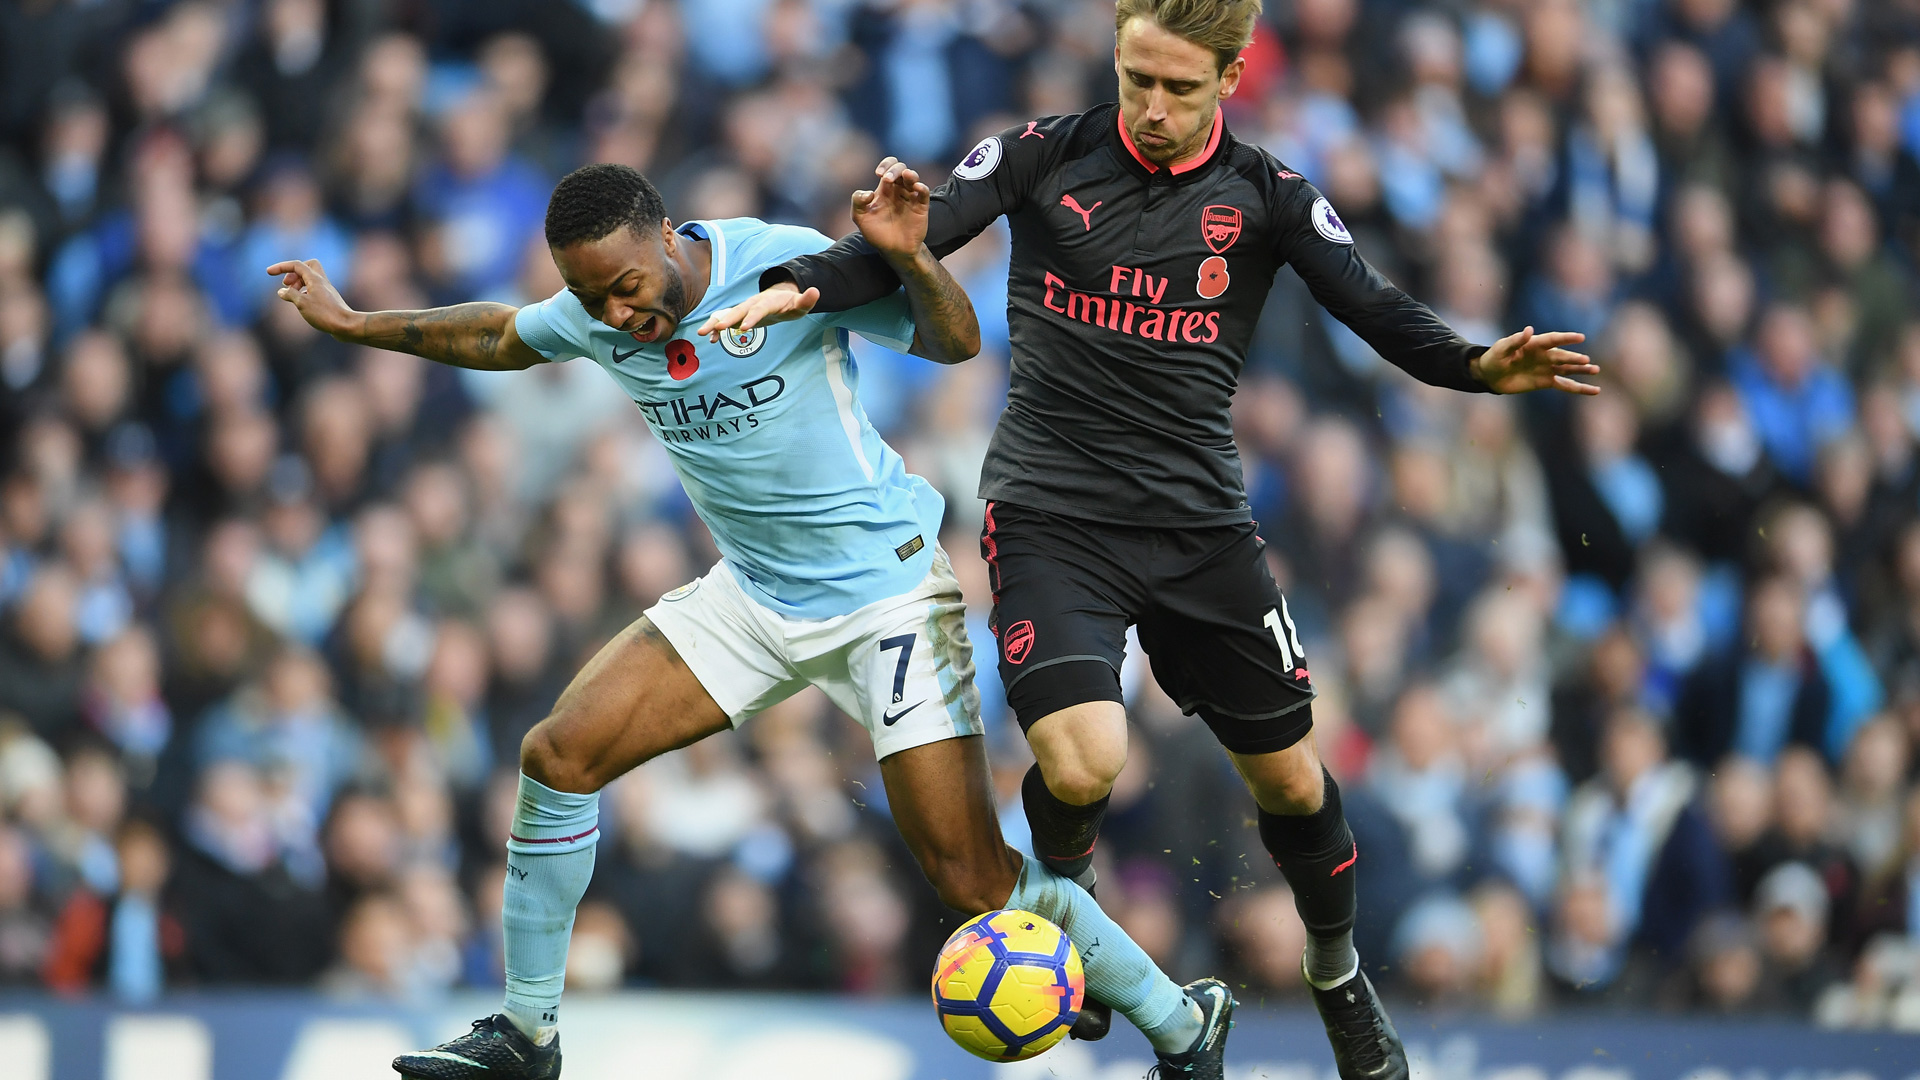 Raheem Sterling Nacho Monreal Premier League Manchester City FC Arsenal 110517